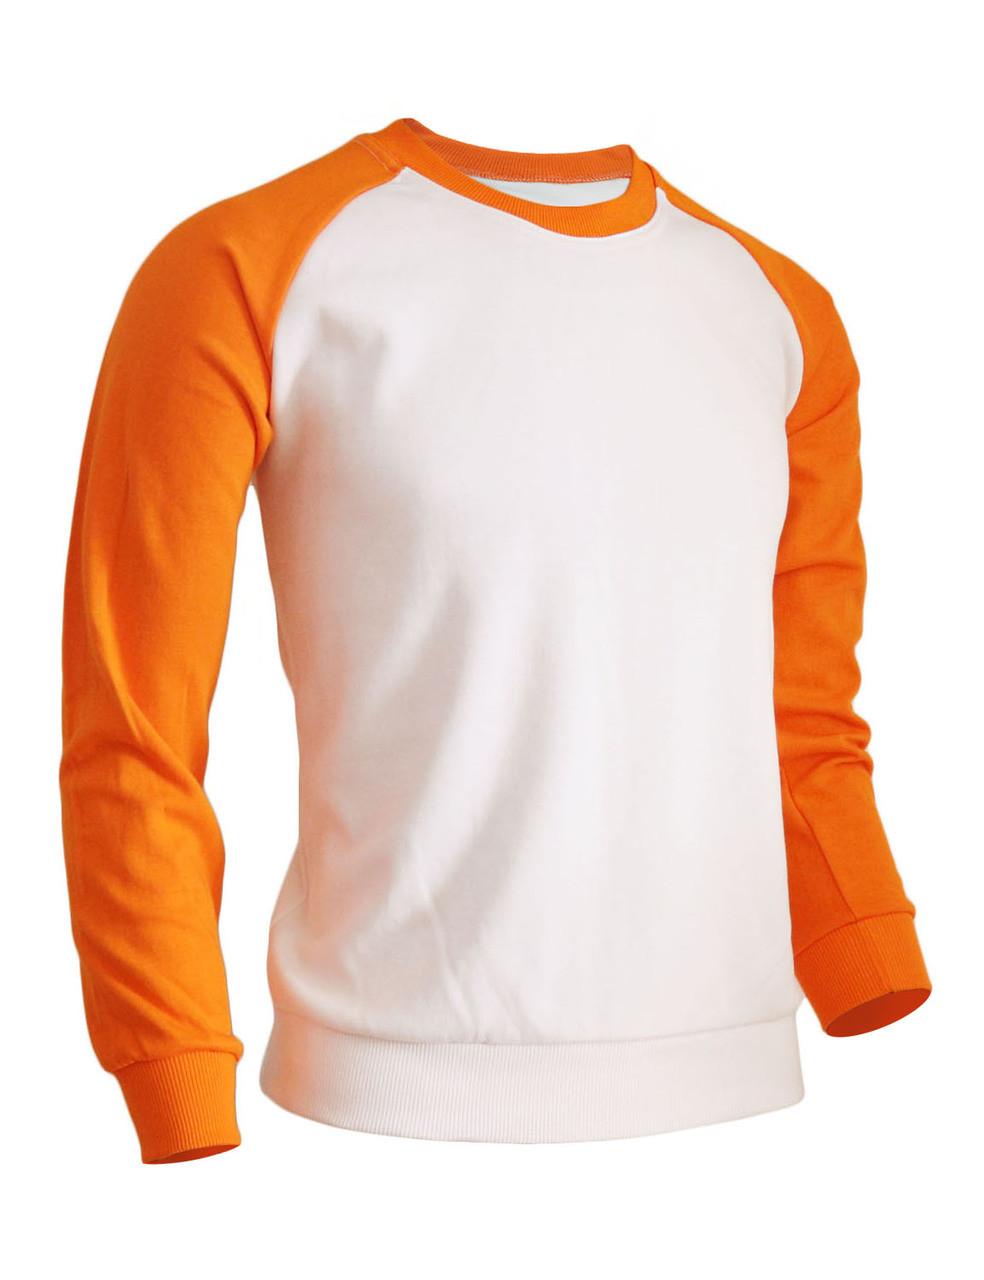 6df7ffdc BCPOLO Men's Casual raglan 2 tone color t-shirt sportswear fashion ...